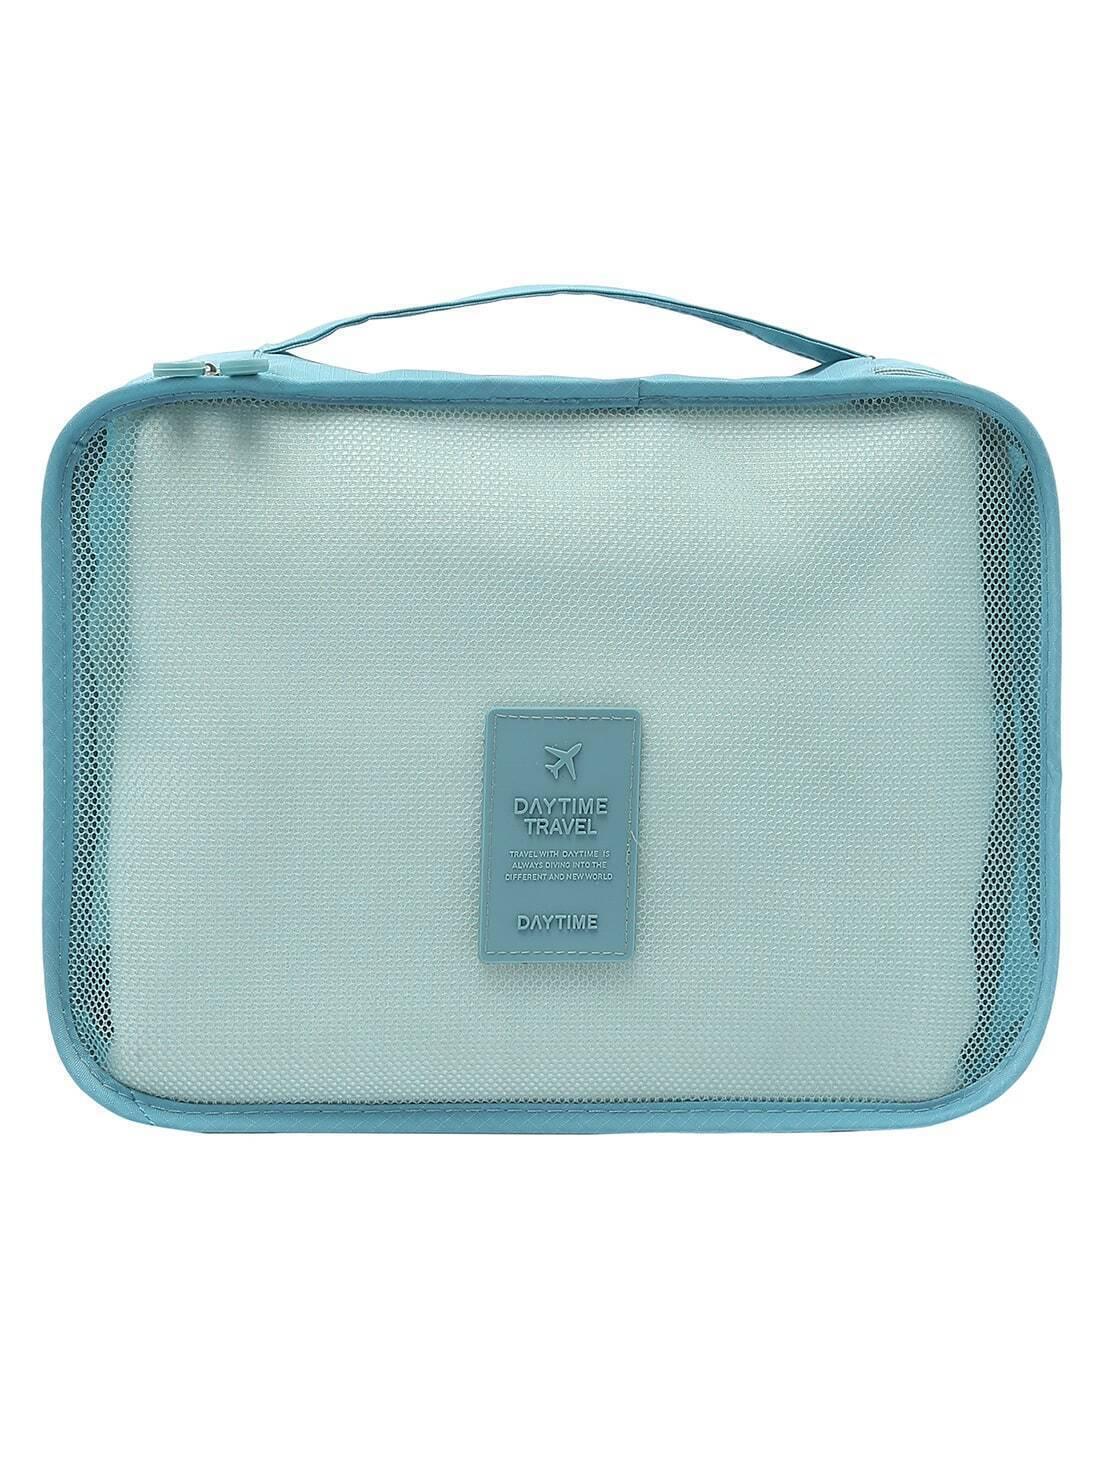 multifunktionale tasche set mit rei verschluss azurblau german romwe. Black Bedroom Furniture Sets. Home Design Ideas